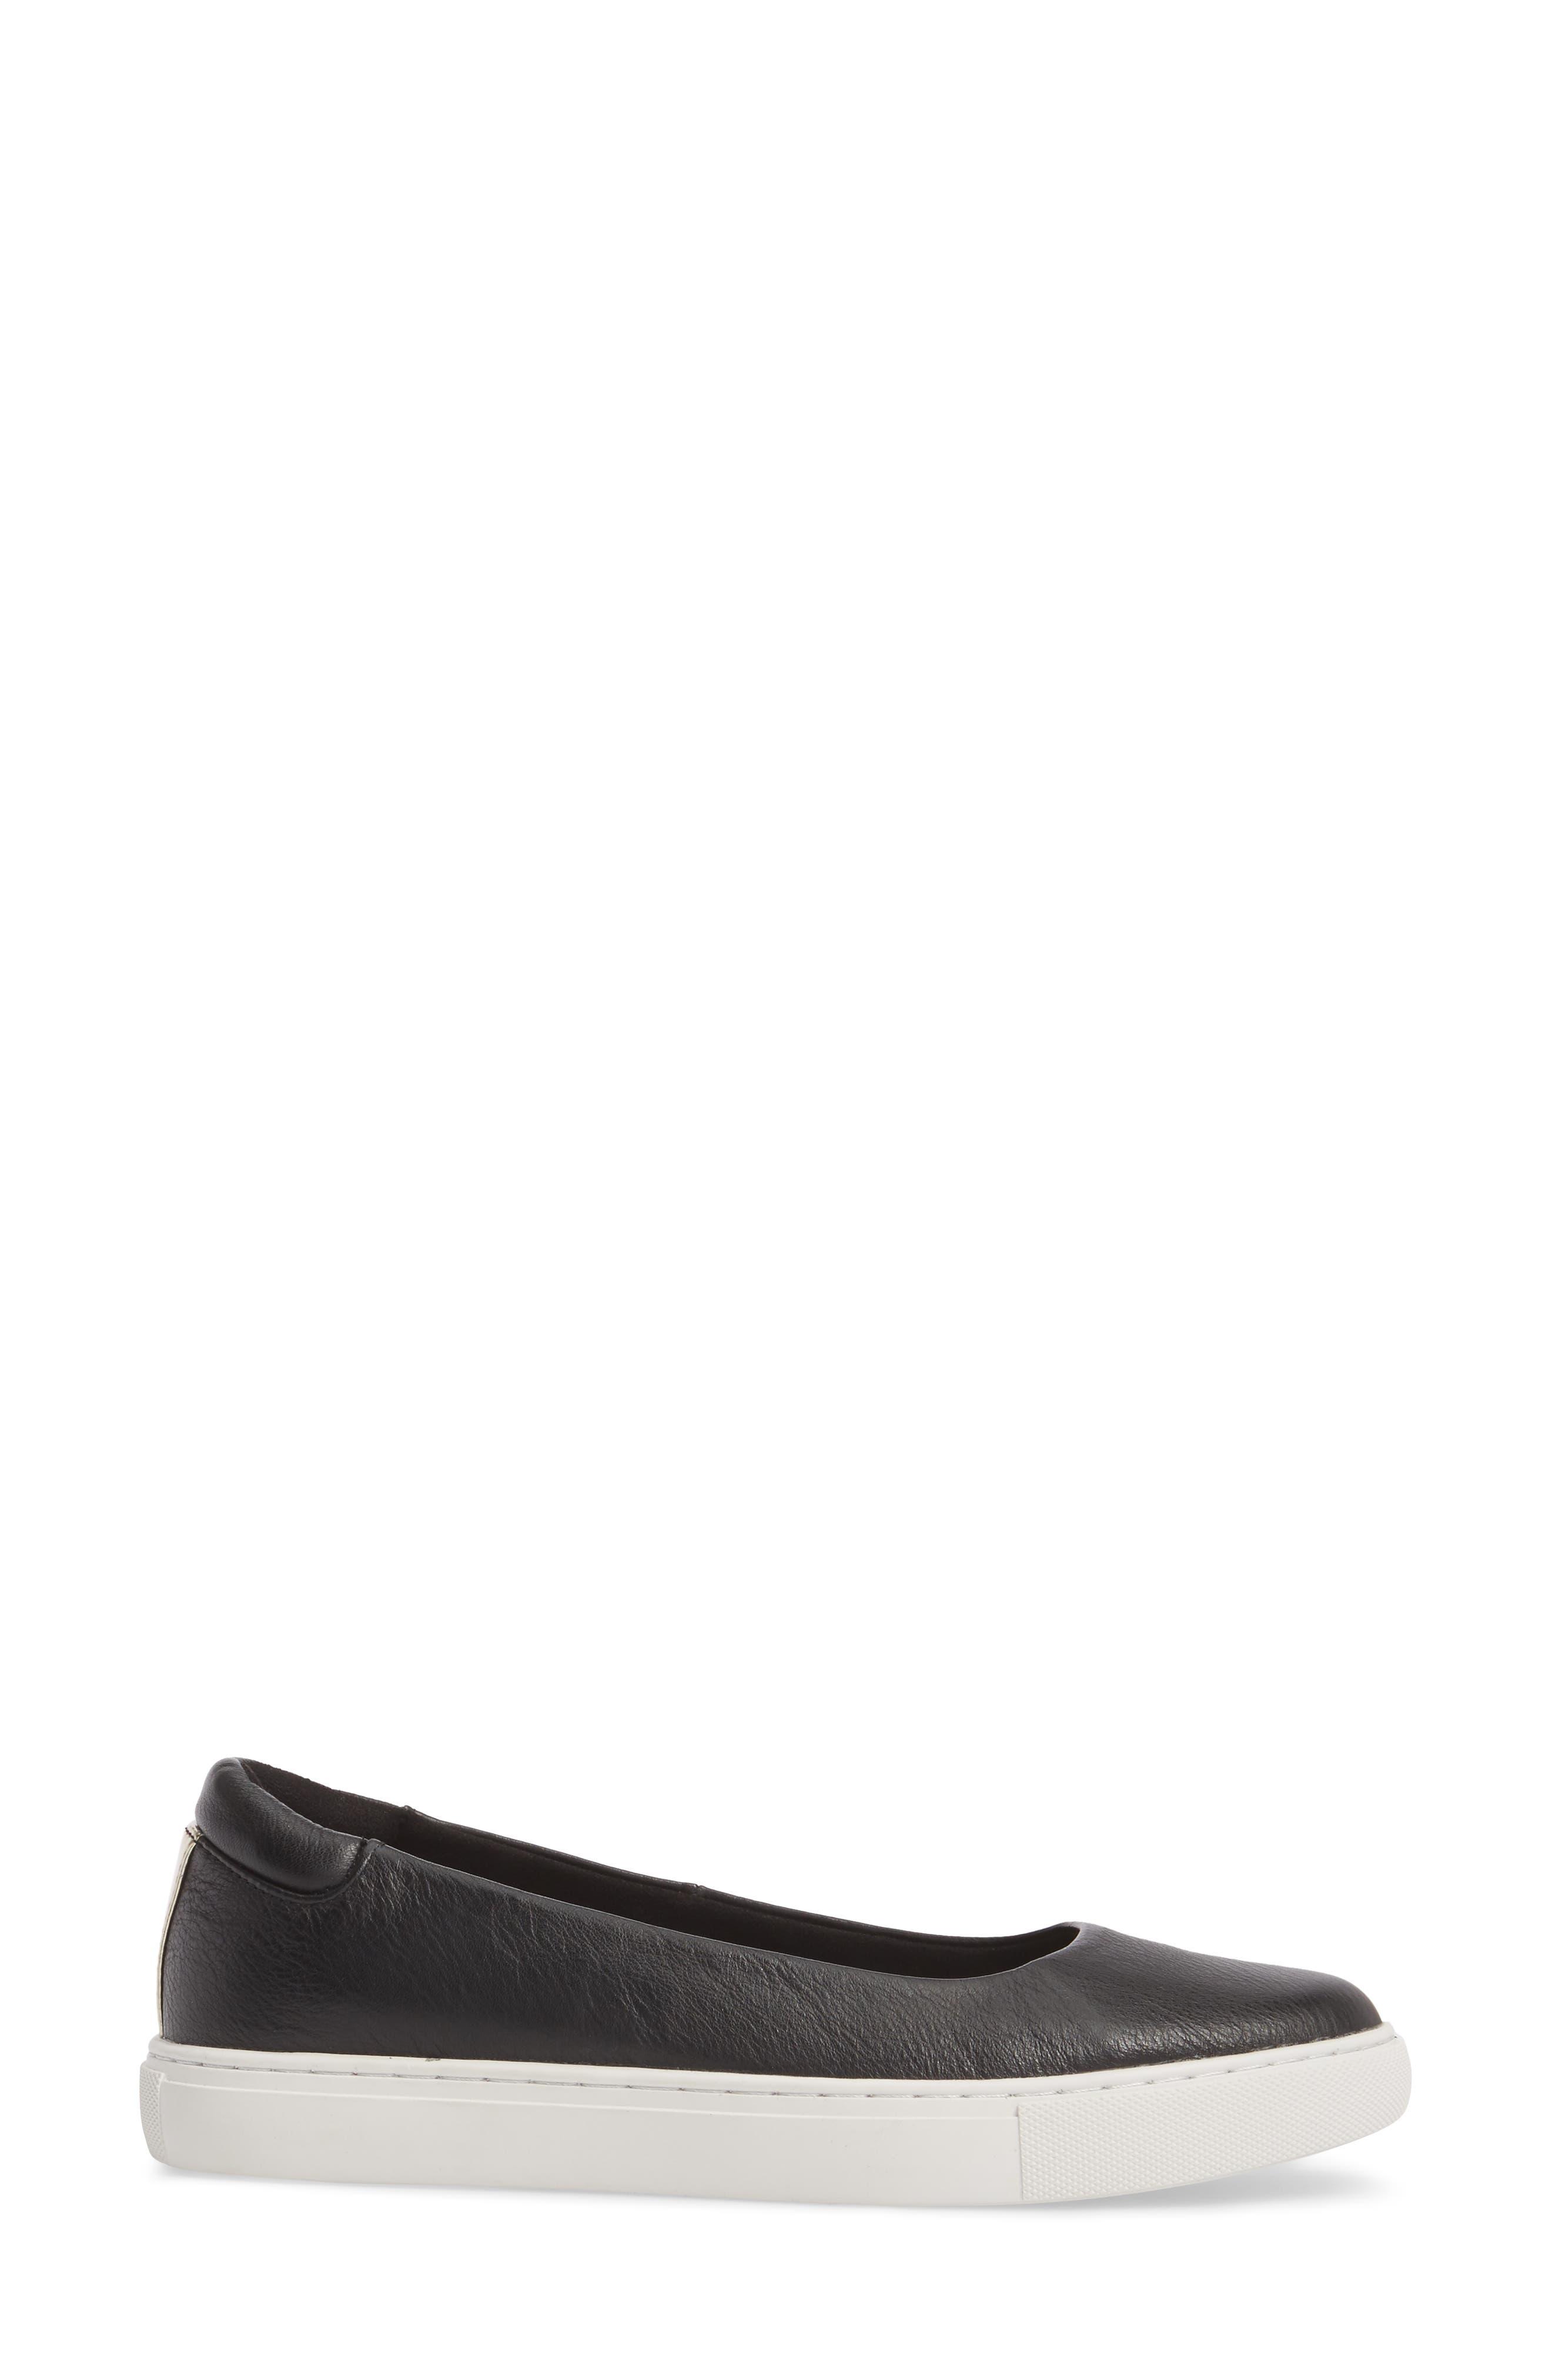 Kassie Flat,                             Alternate thumbnail 3, color,                             Black Leather